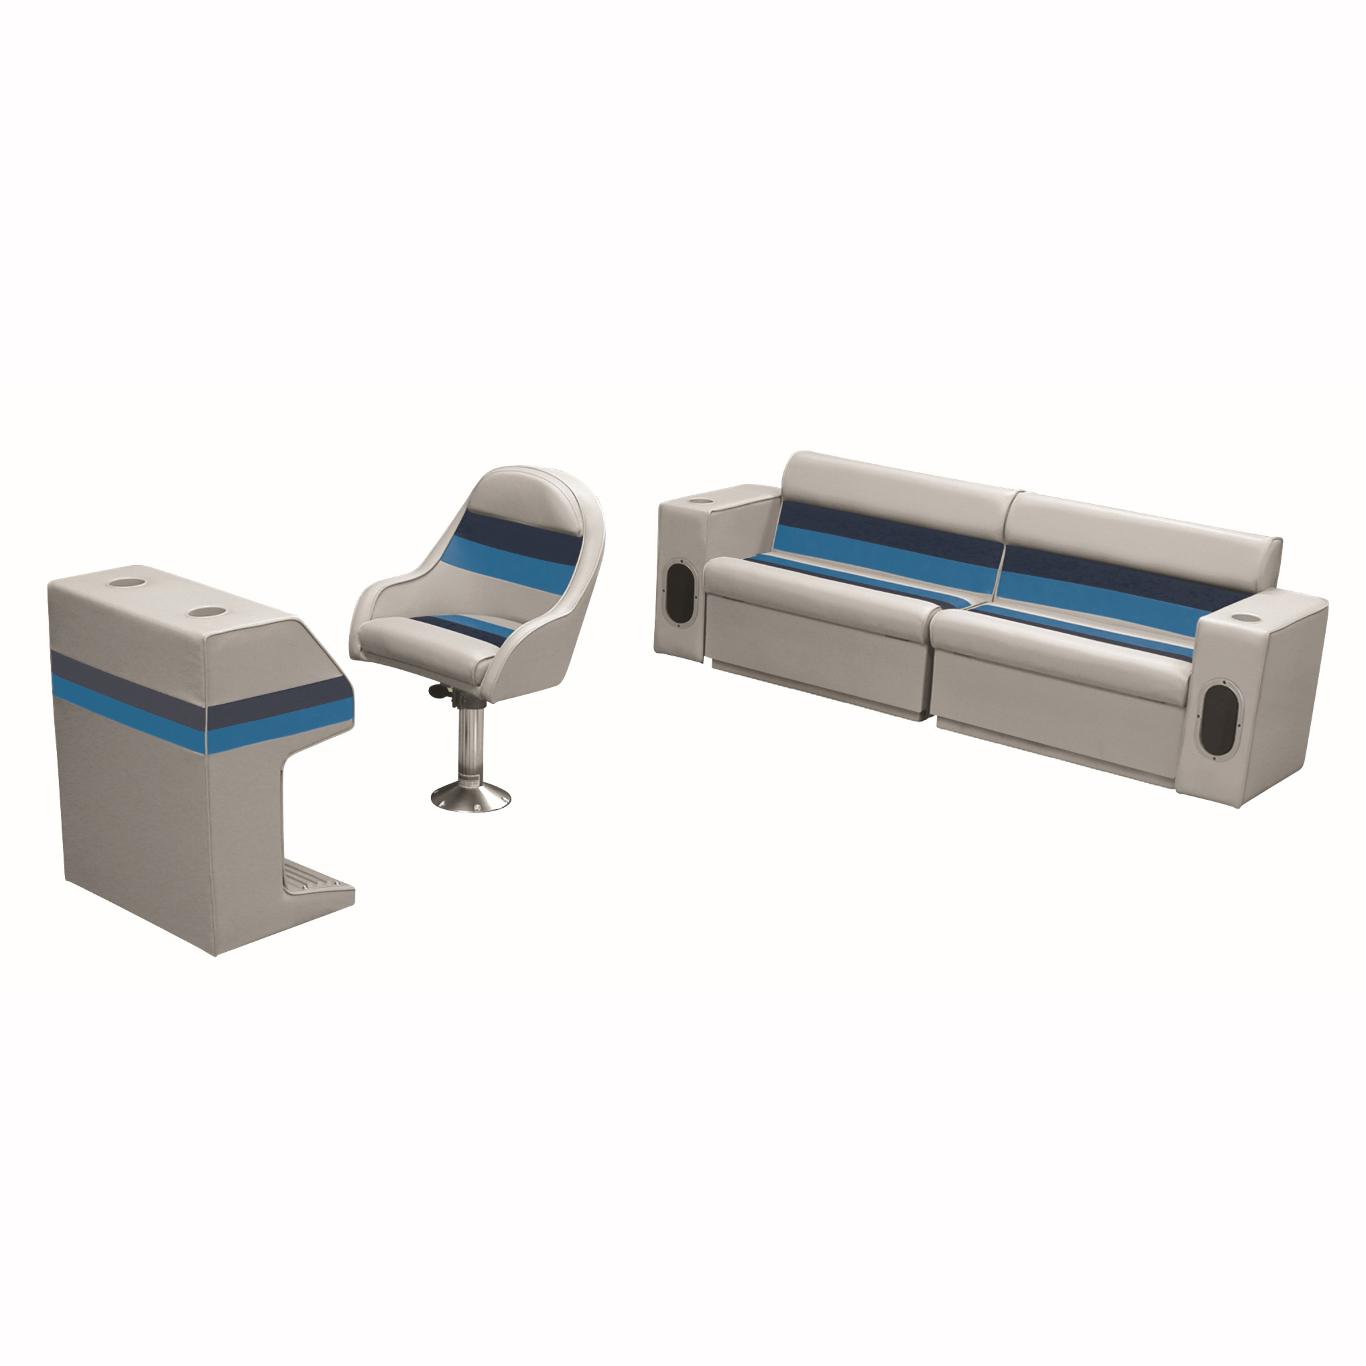 Deluxe Pontoon Furniture w/Toe Kick Base - Rear Basic Package, Gray/Navy/Blue